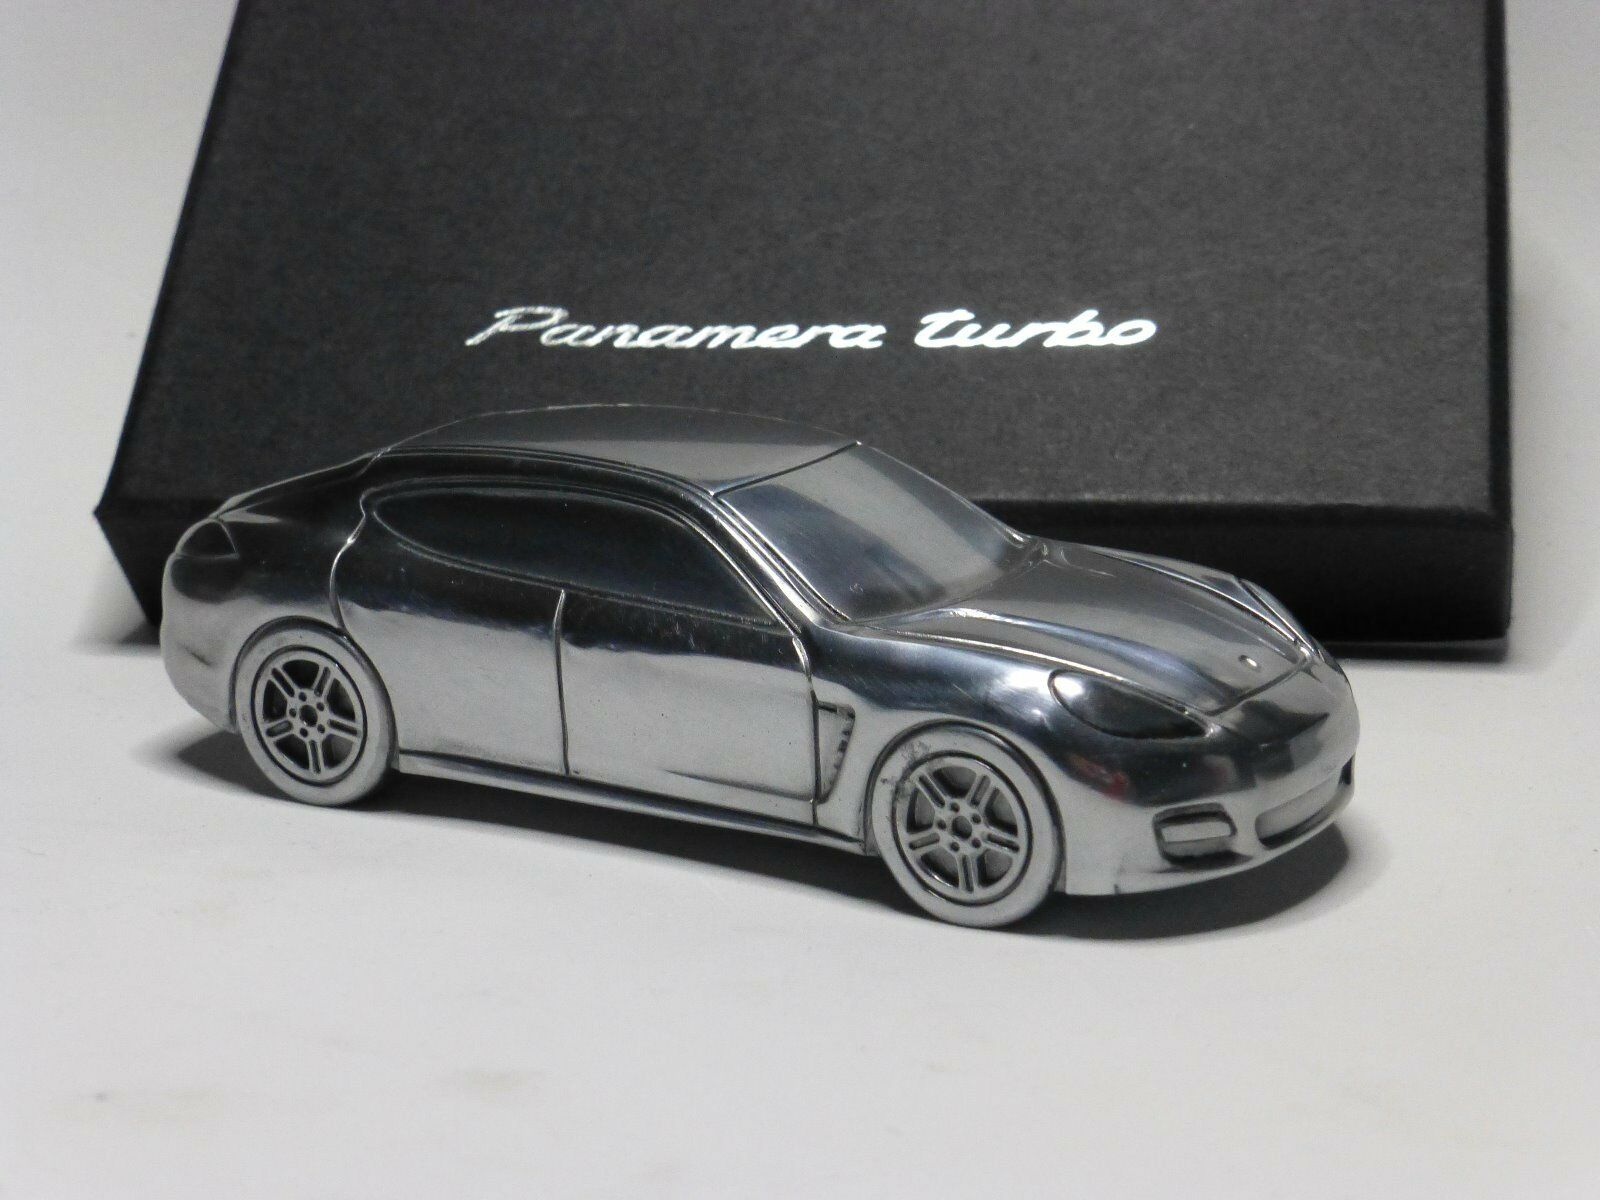 Exclusivo Porsche Panamera macizo Edición Limitada 1:43 color plata plata plata pulida. f11e8f